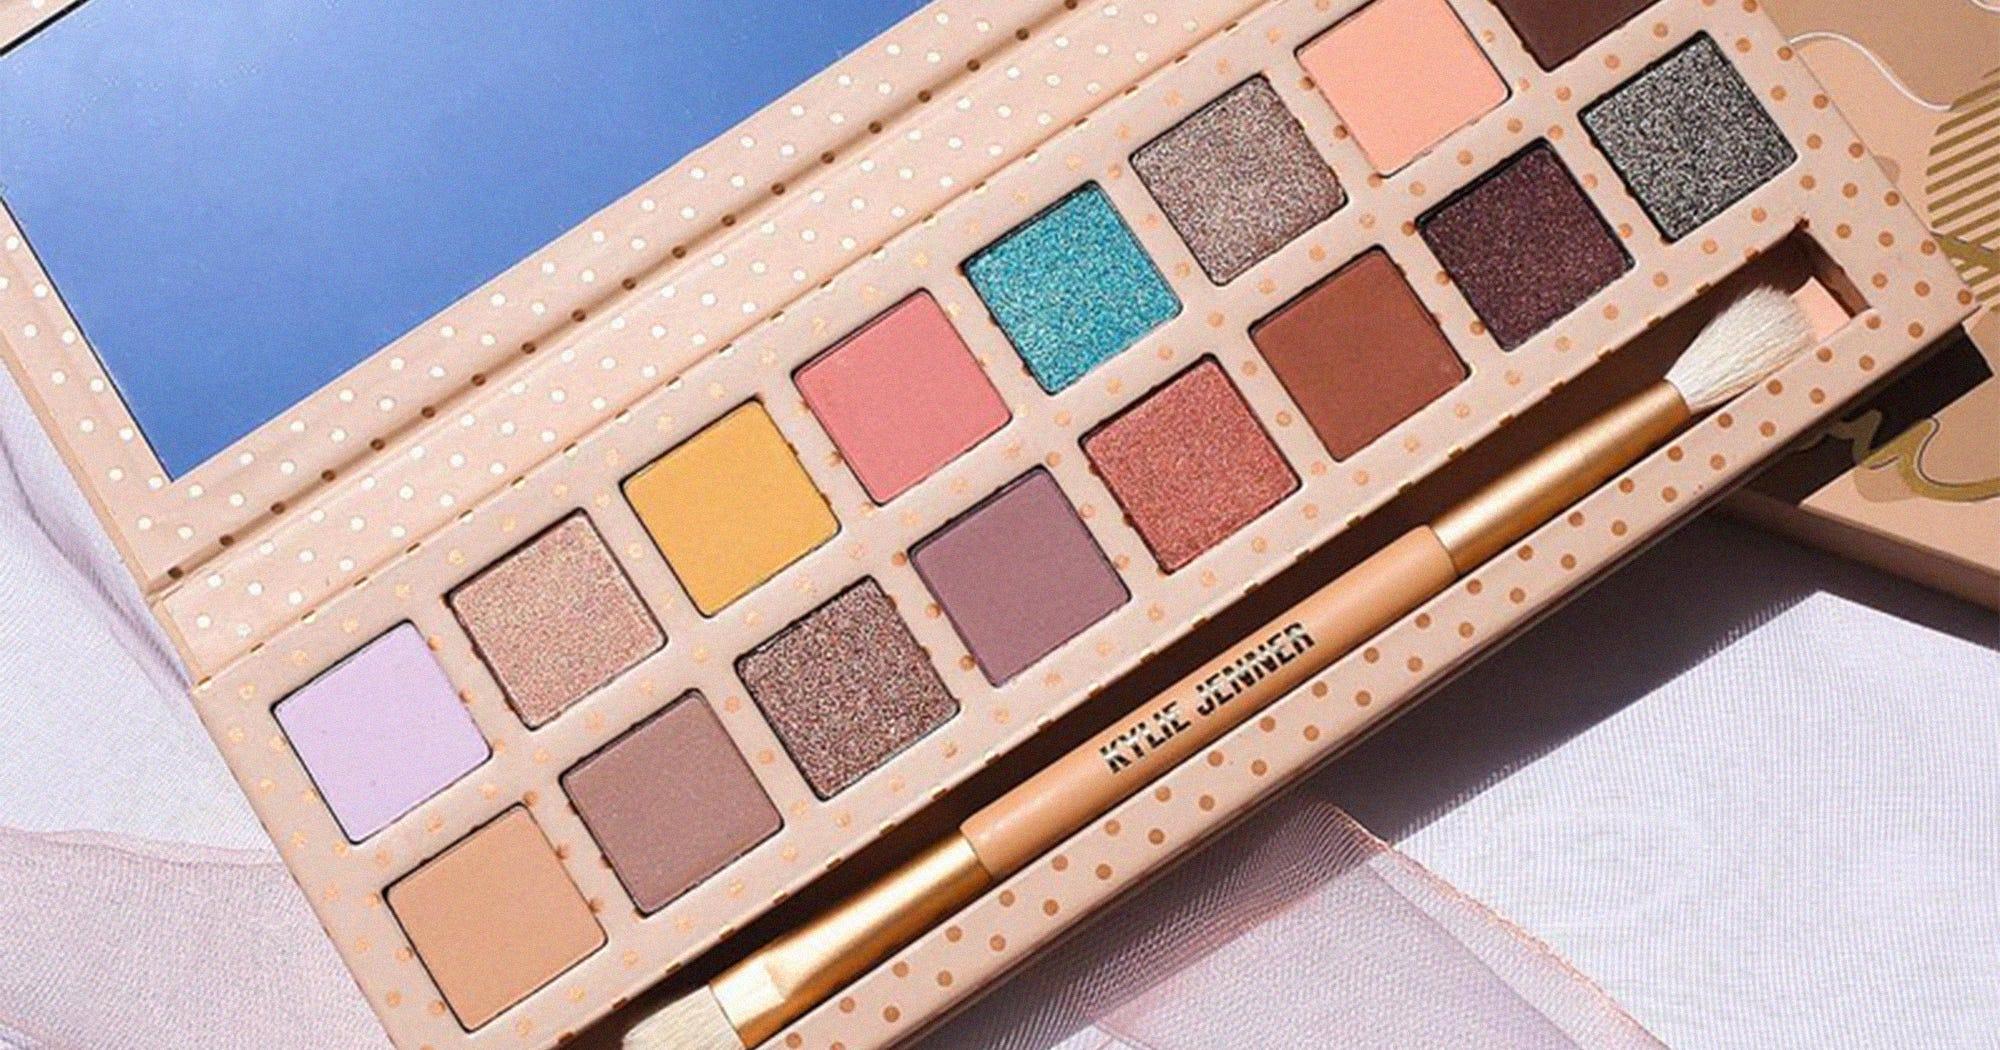 Kylie X Jordyn Highlighter Quad Palette by Kylie Cosmetics #7